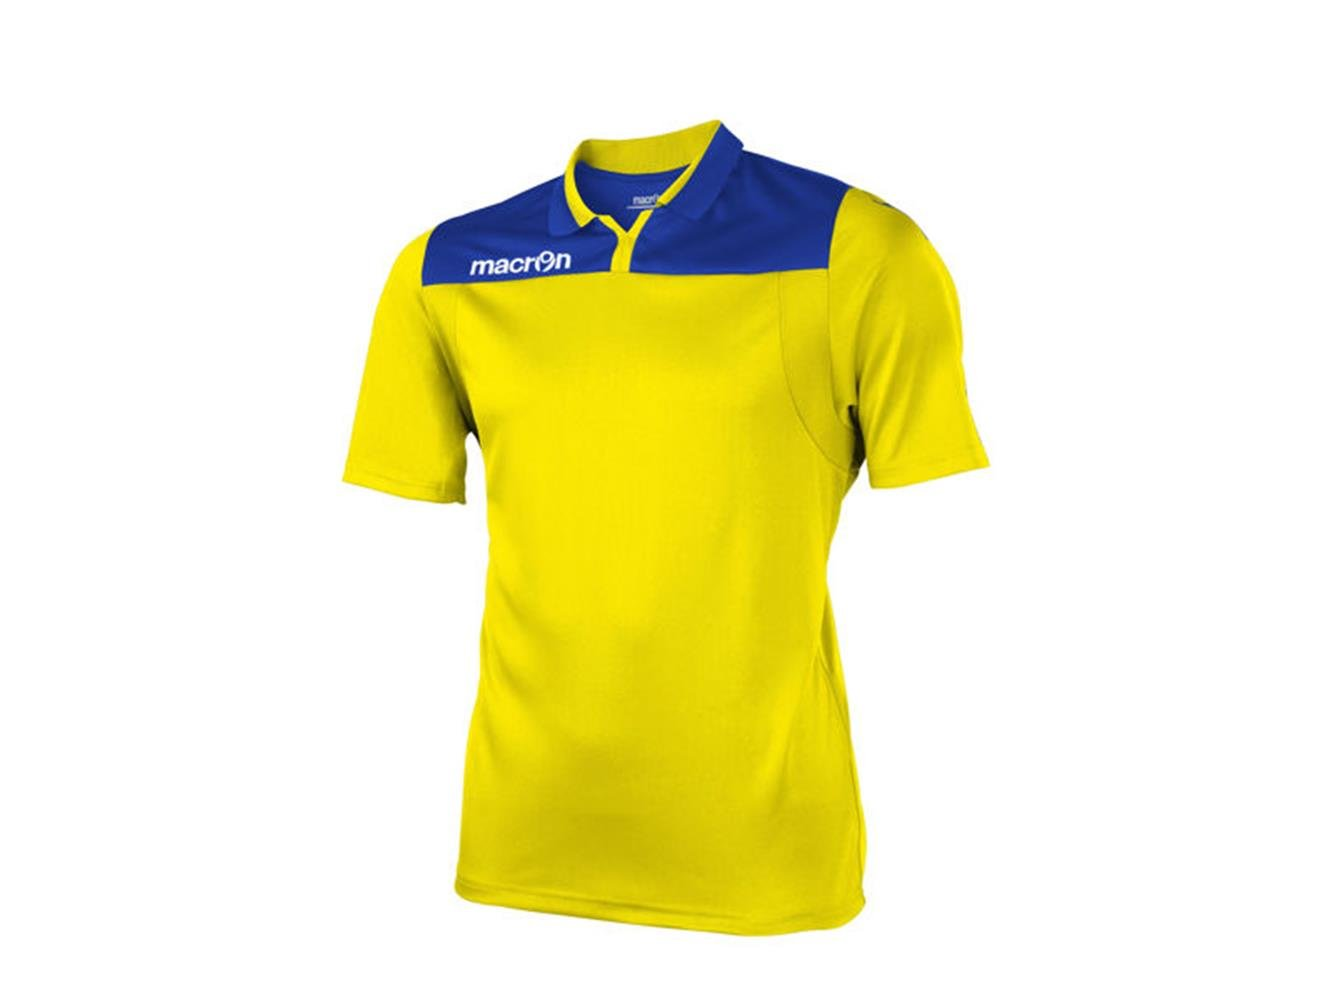 ATELIER DEL RICAMO Camiseta Fútbol Manga Corta Macron Diadem: Amazon.es: Deportes y aire libre